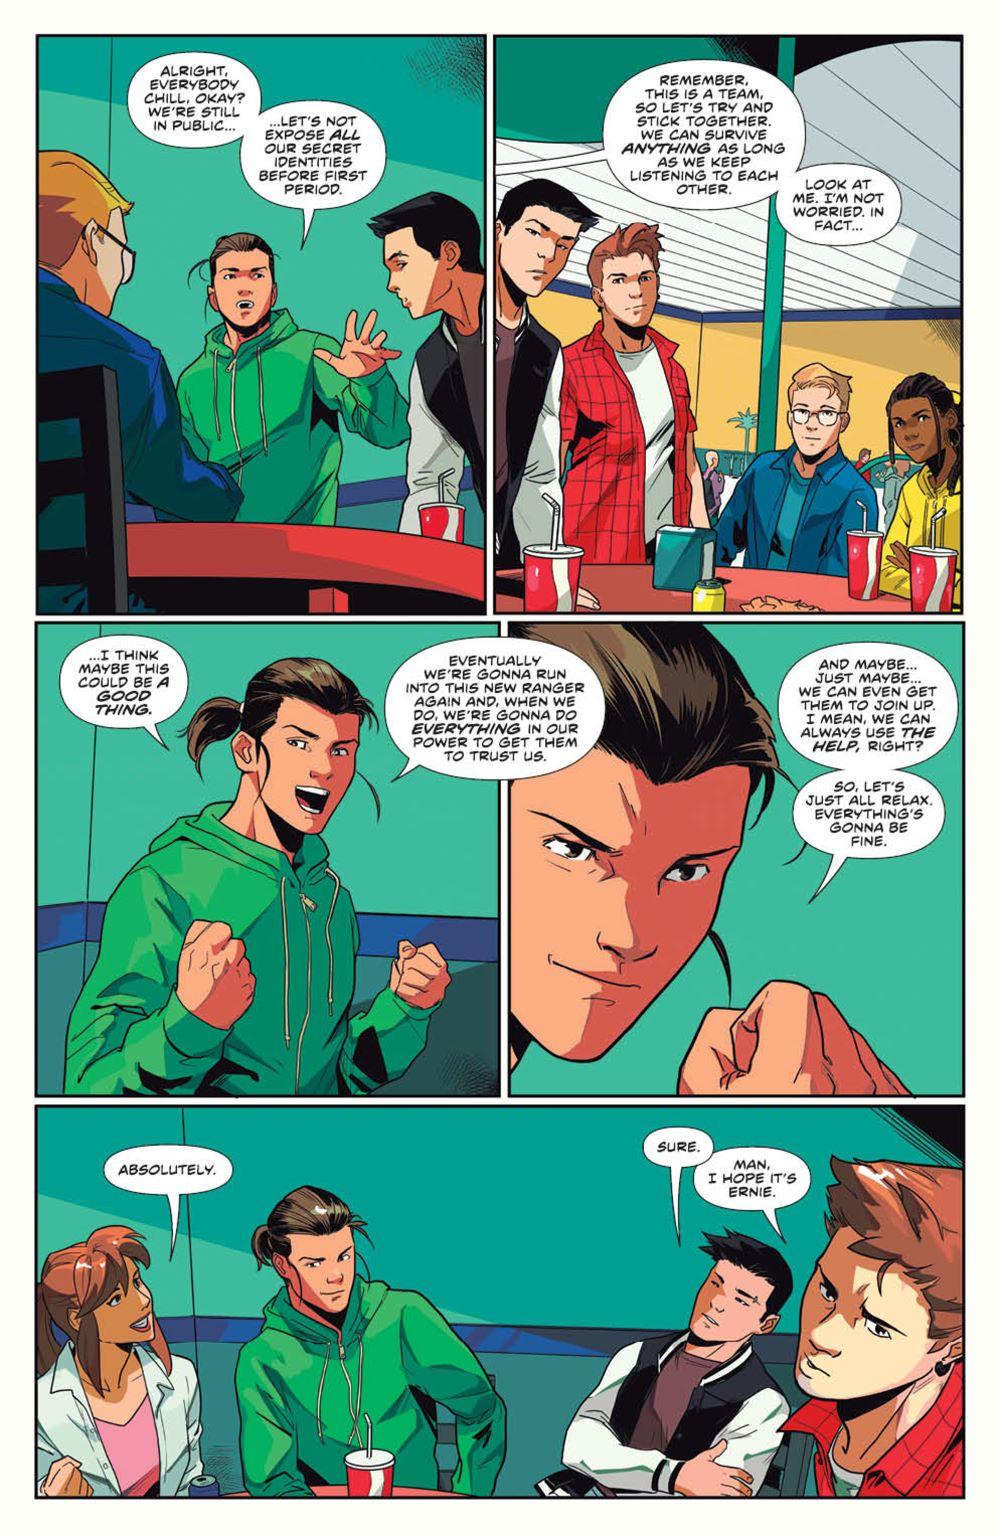 MightyMorphin_v1_SC_PRESS_14 ComicList Previews: MIGHTY MORPHIN VOLUME 1 TP